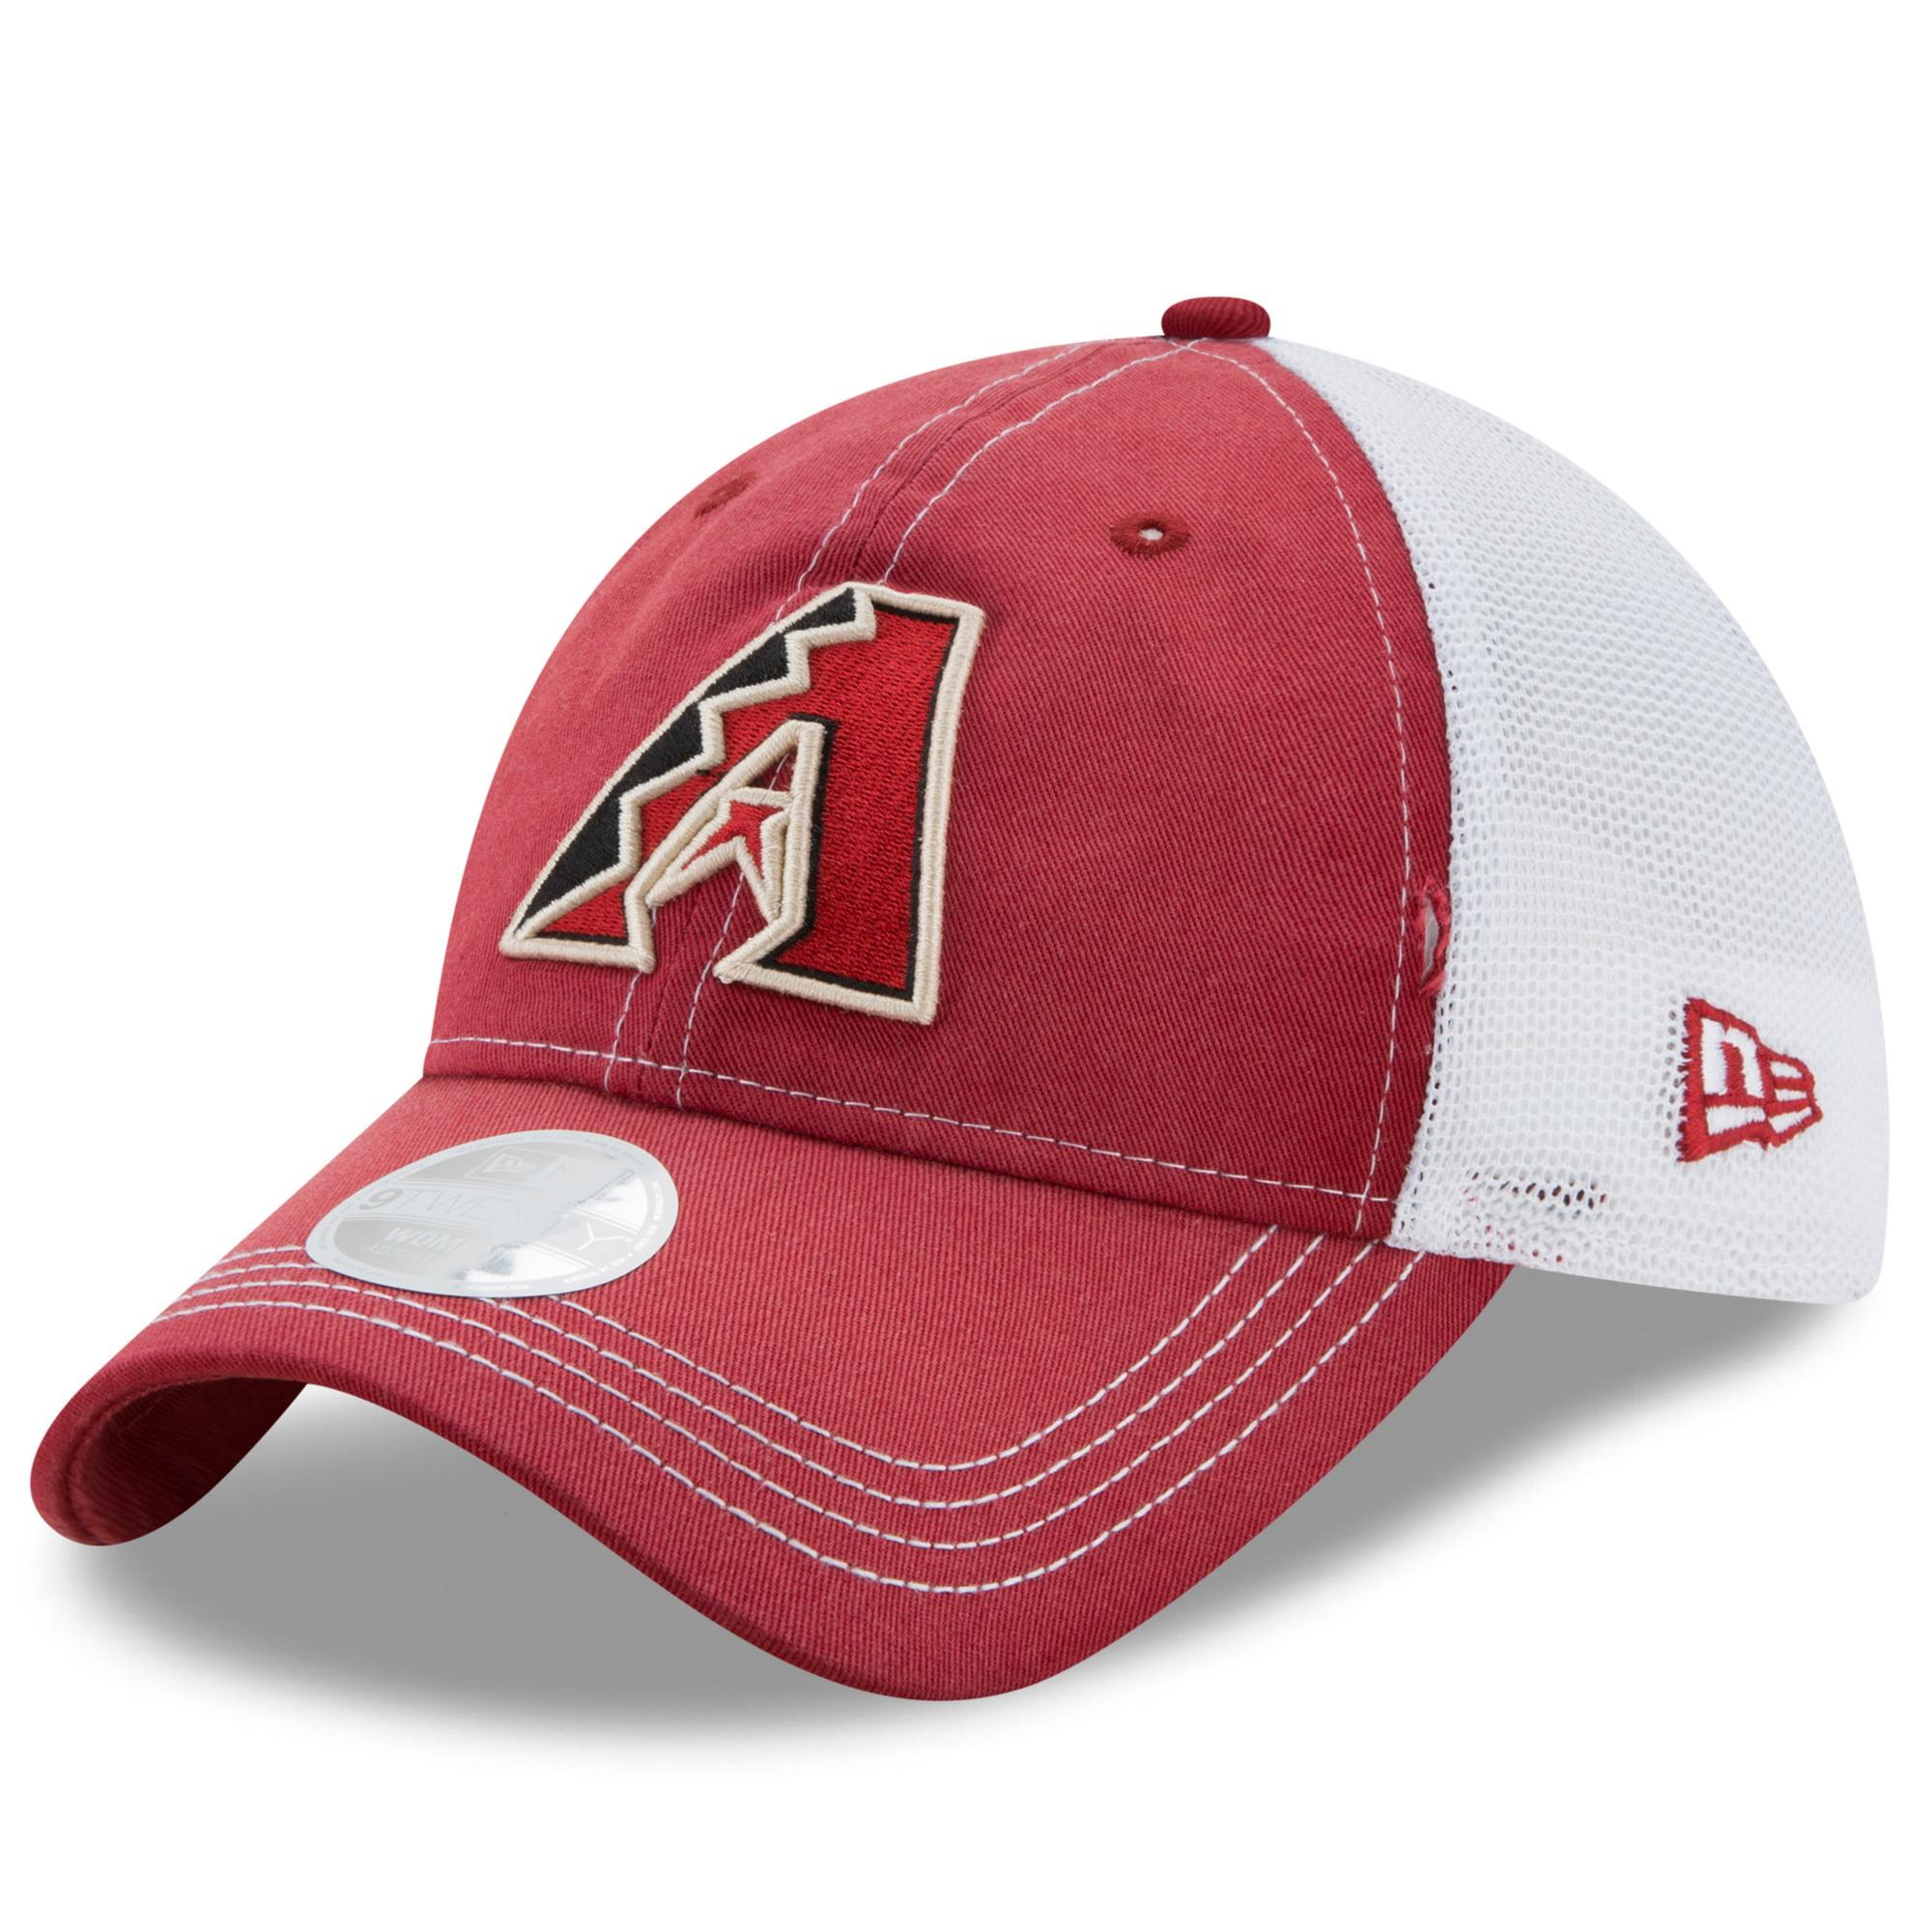 Arizona Diamondbacks New Era Women's Spirited 9TWENTY Adjustable Hat - Red/White - OSFA